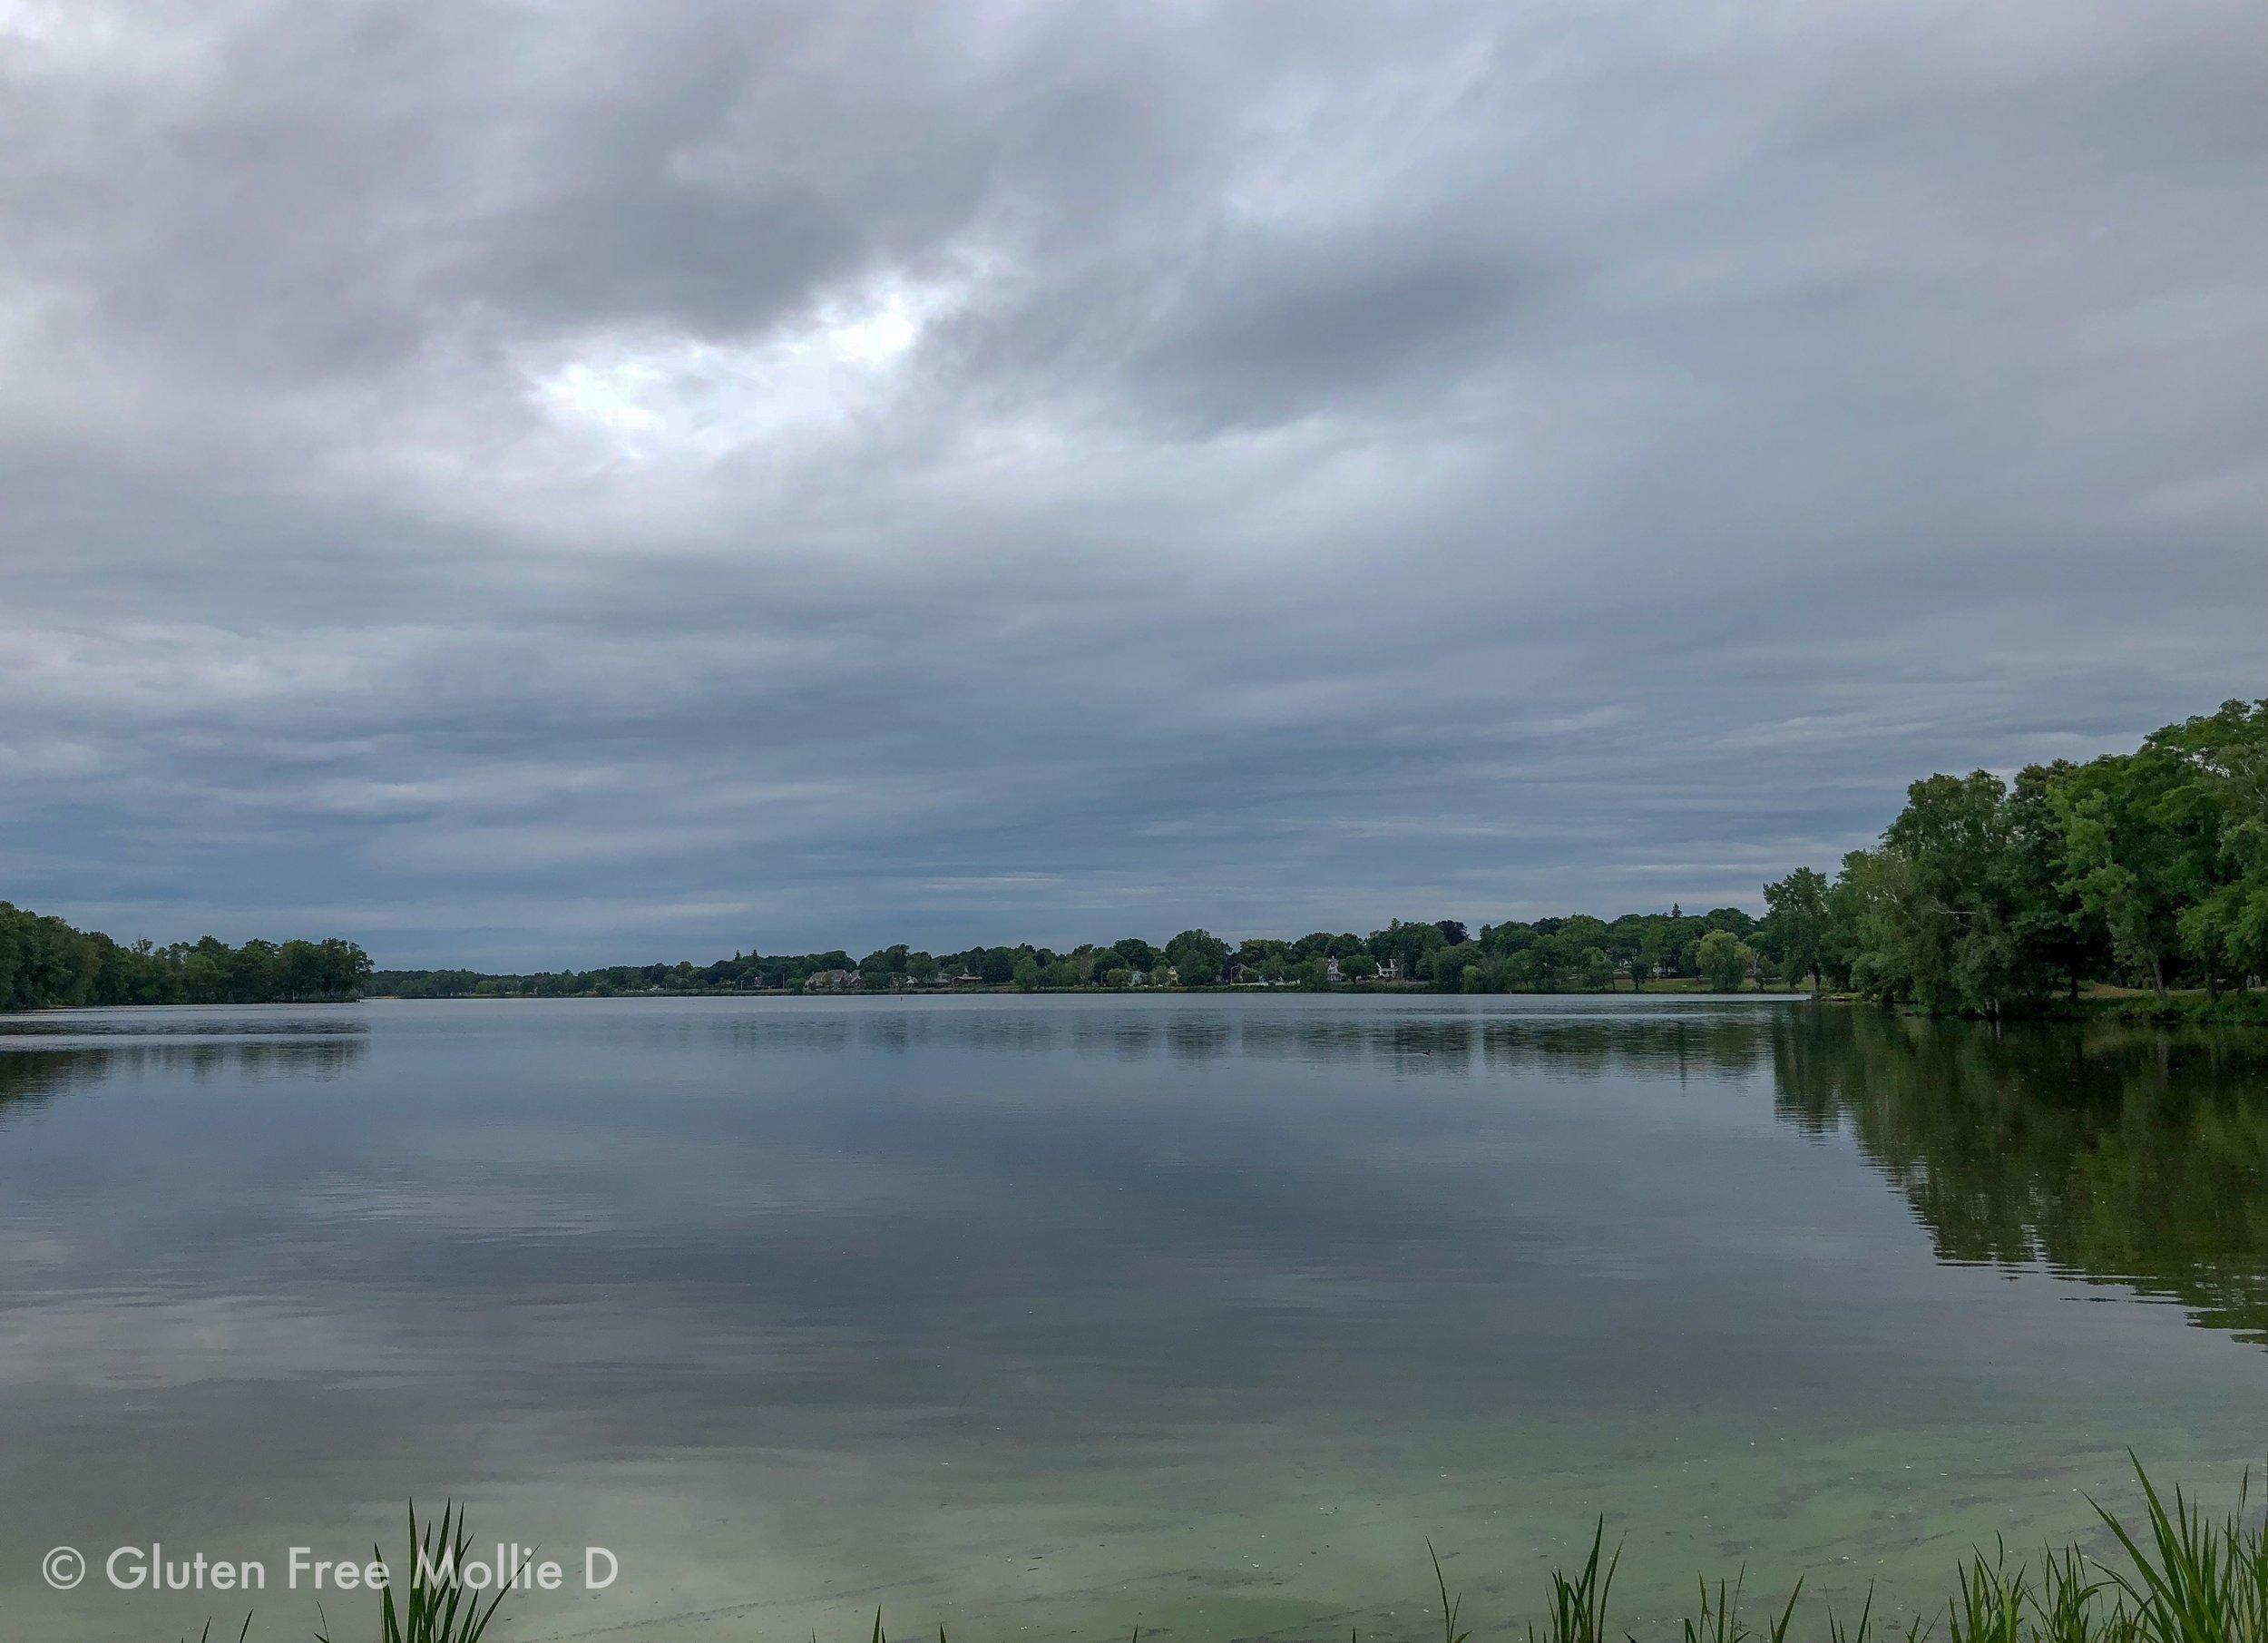 One of my favorite views during our weekend walks.